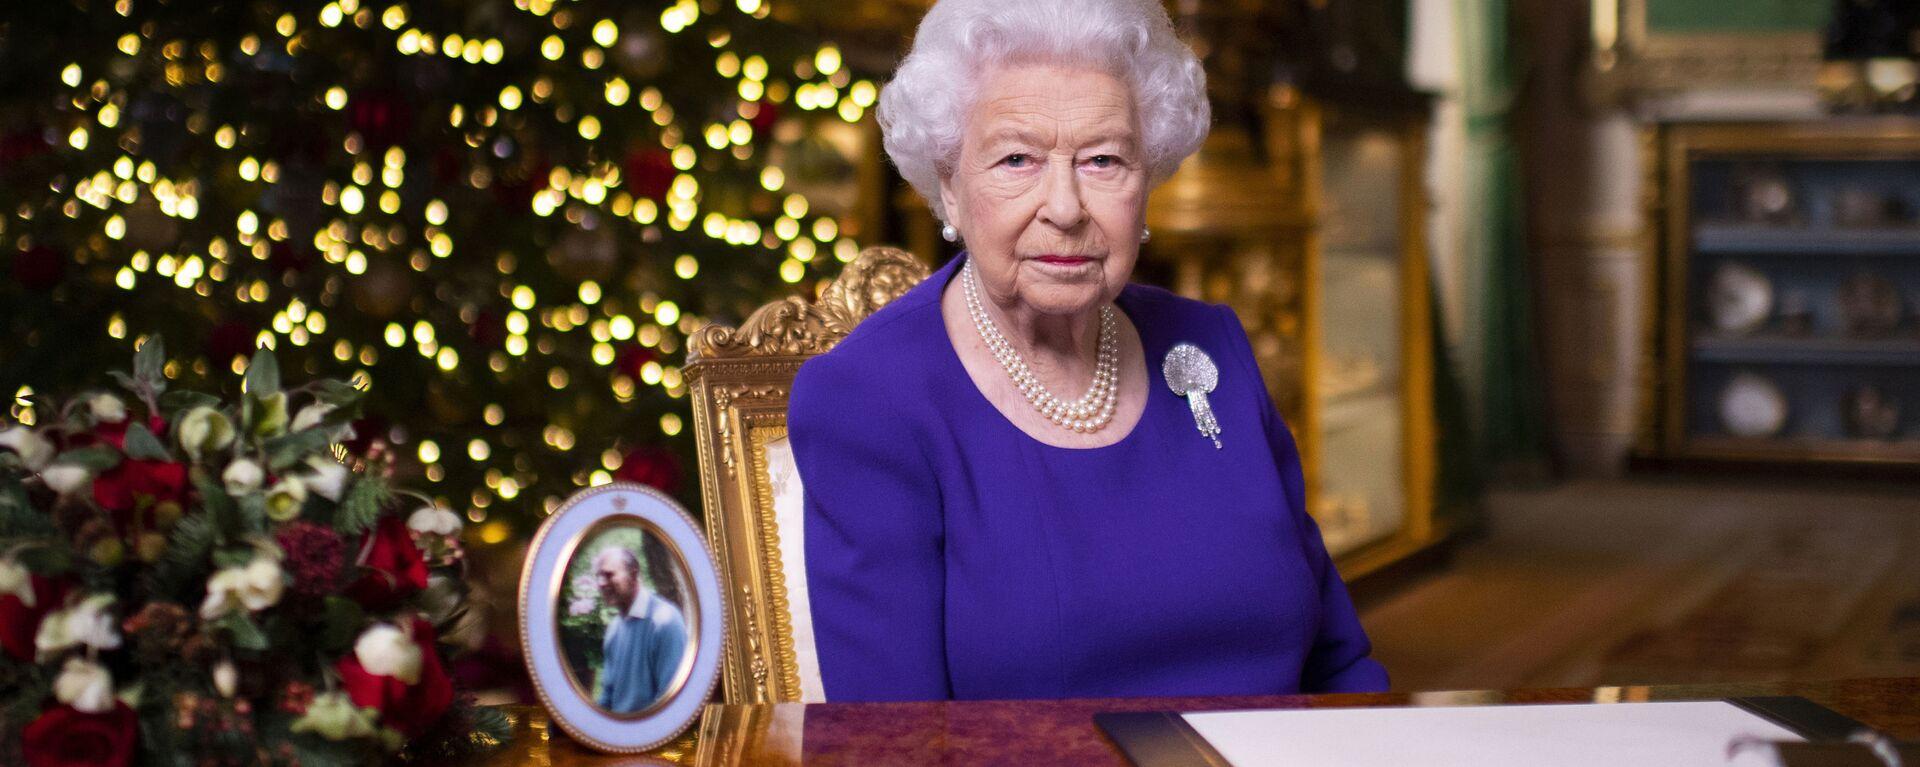 La Regina Elisabetta II - Sputnik Italia, 1920, 26.02.2021